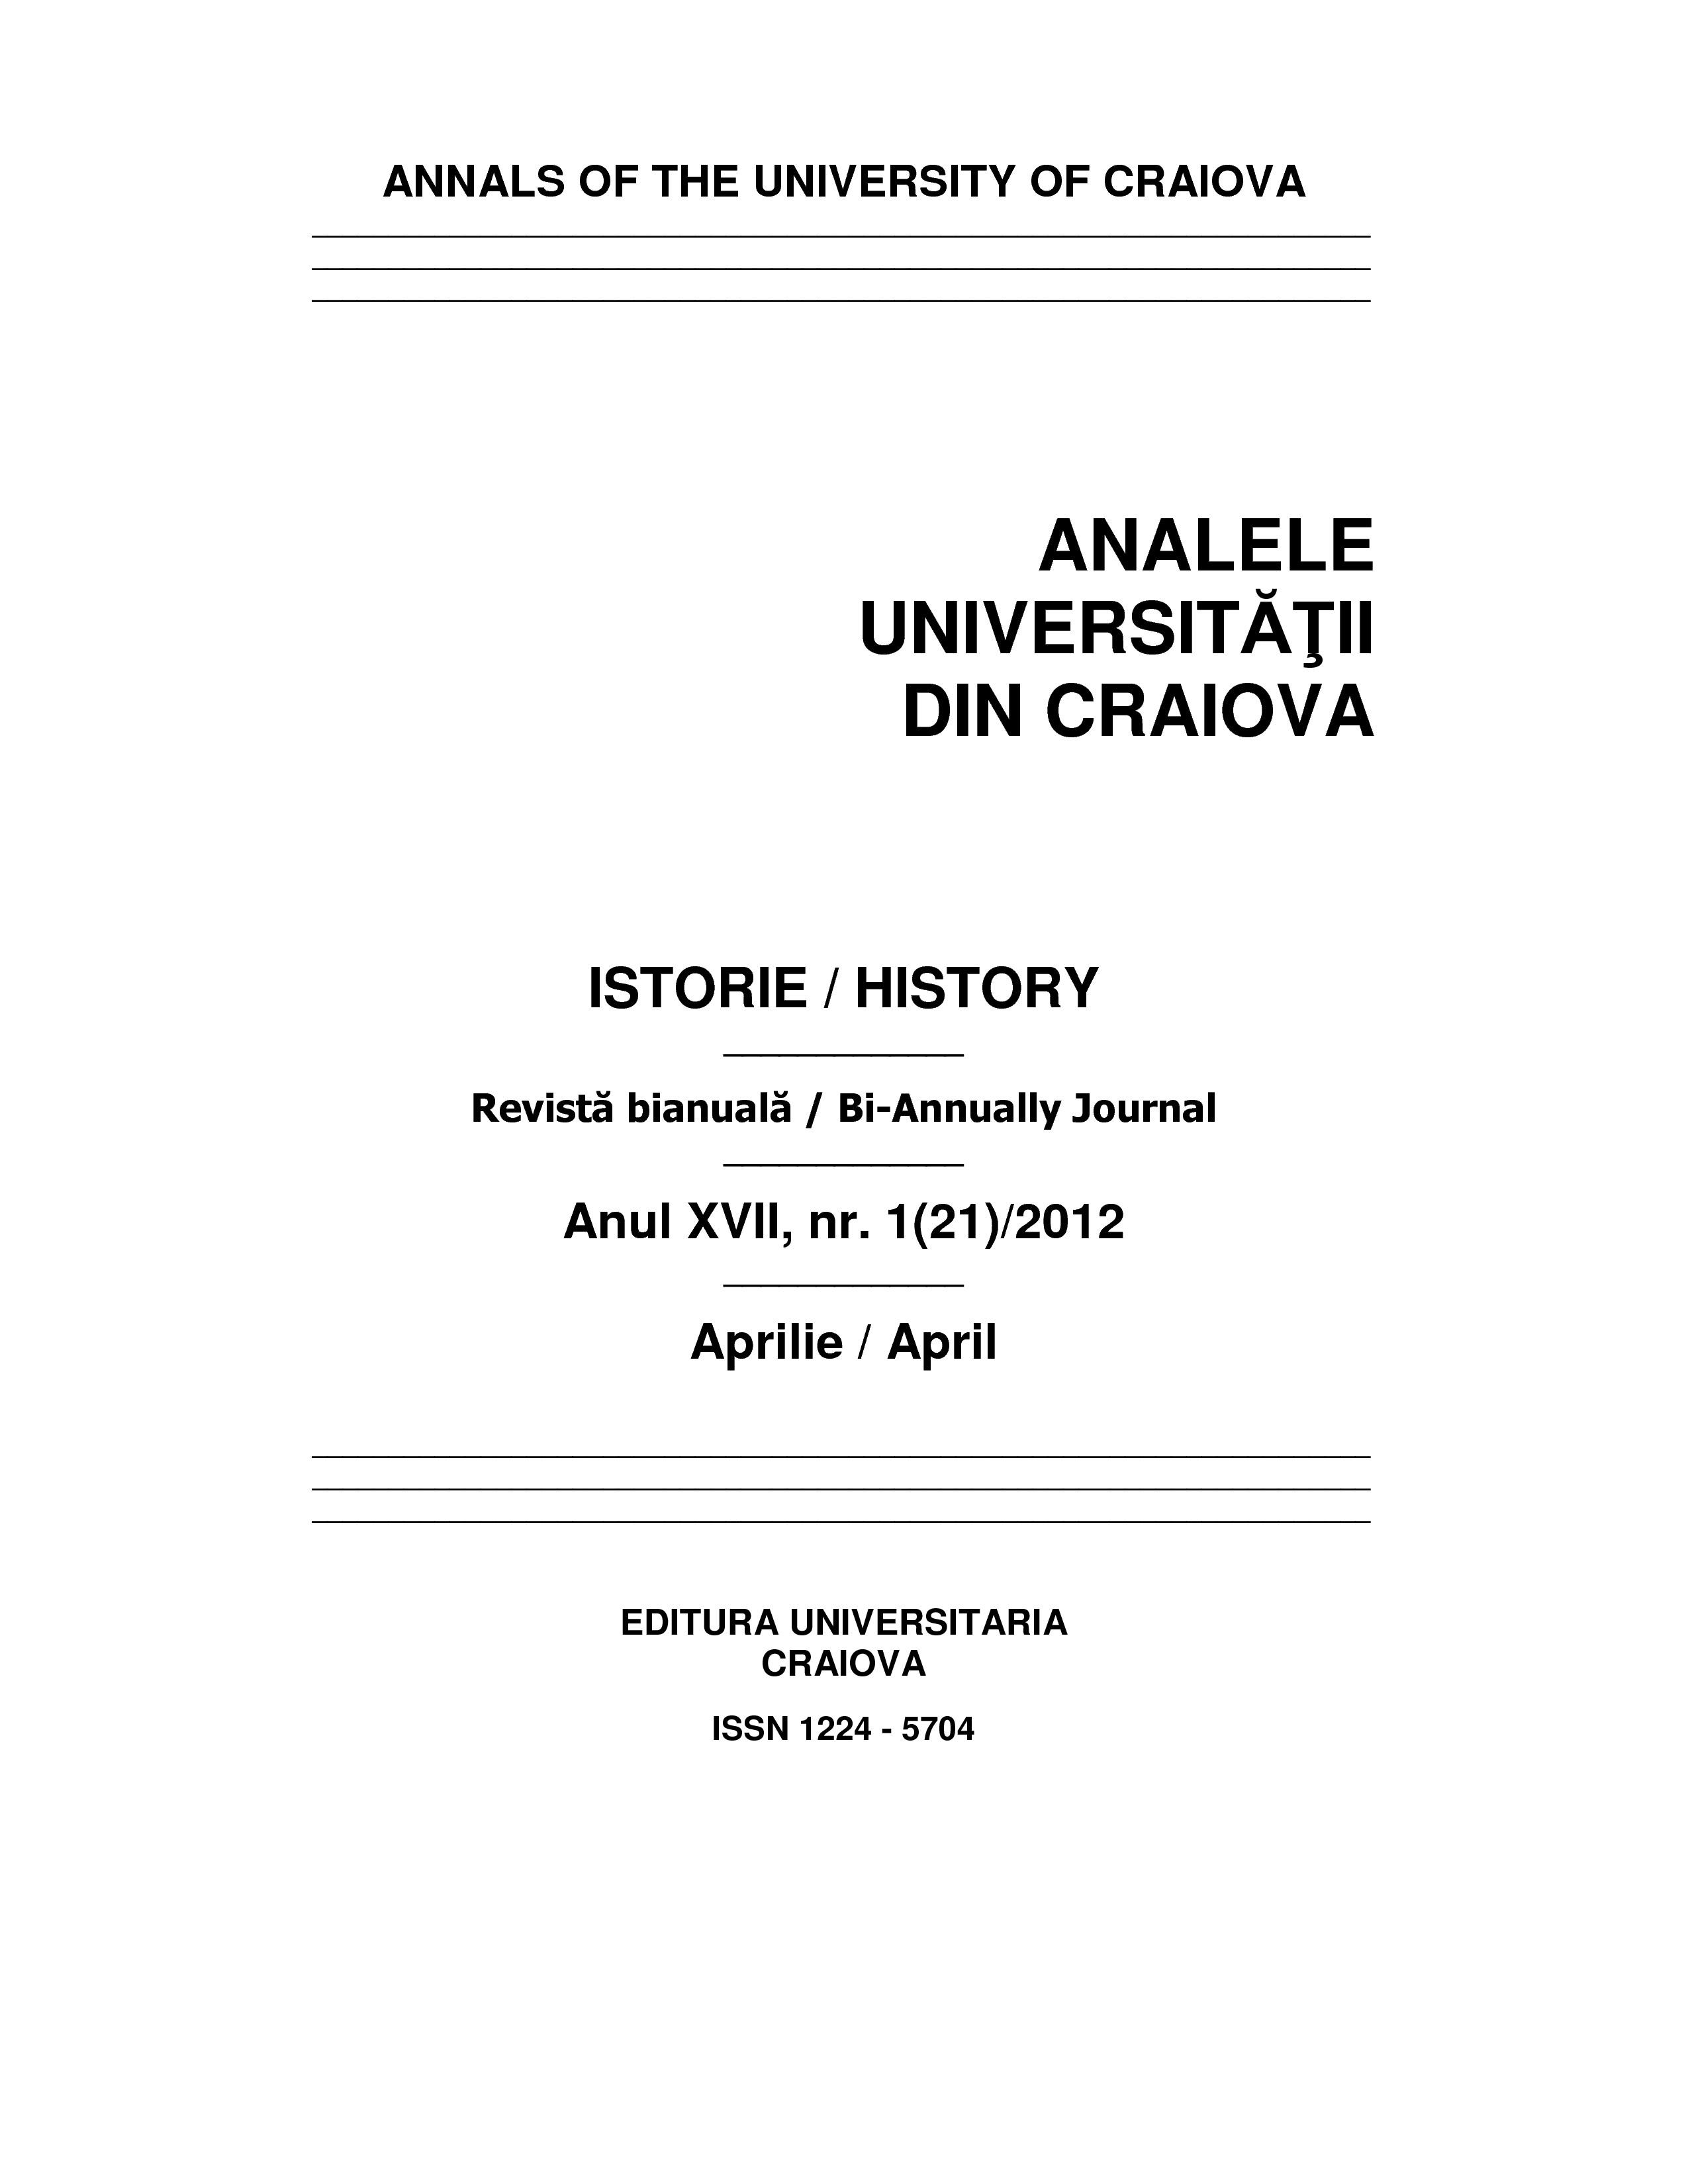 Coperta_Anale_2012_1_ISTORIE_PDF-001-001